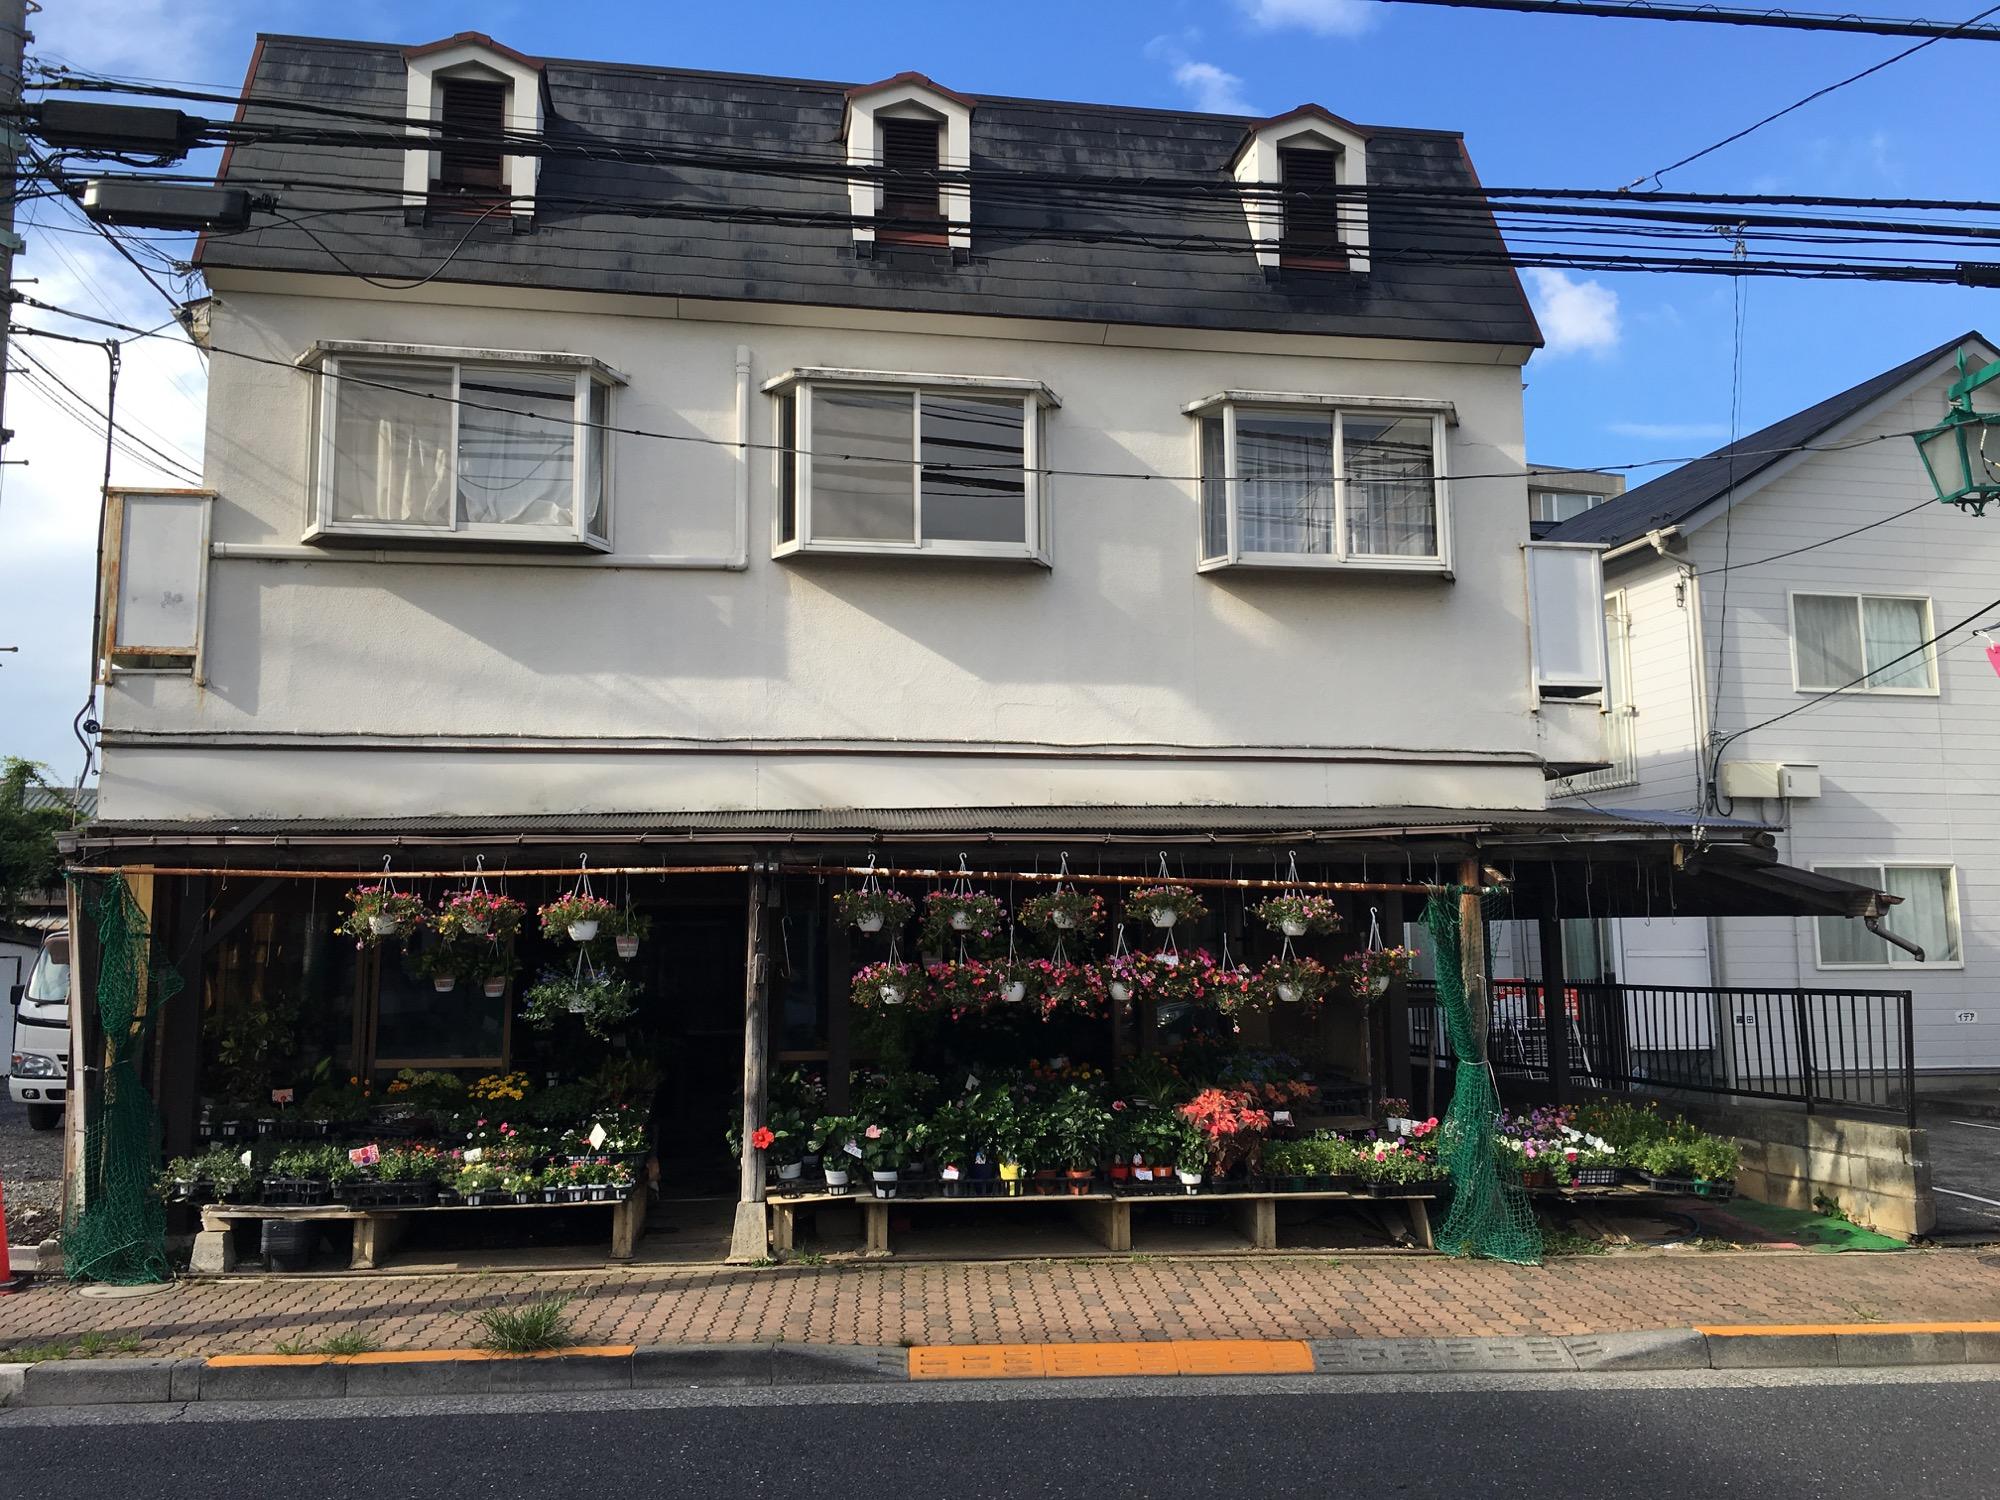 A nearby flower shop